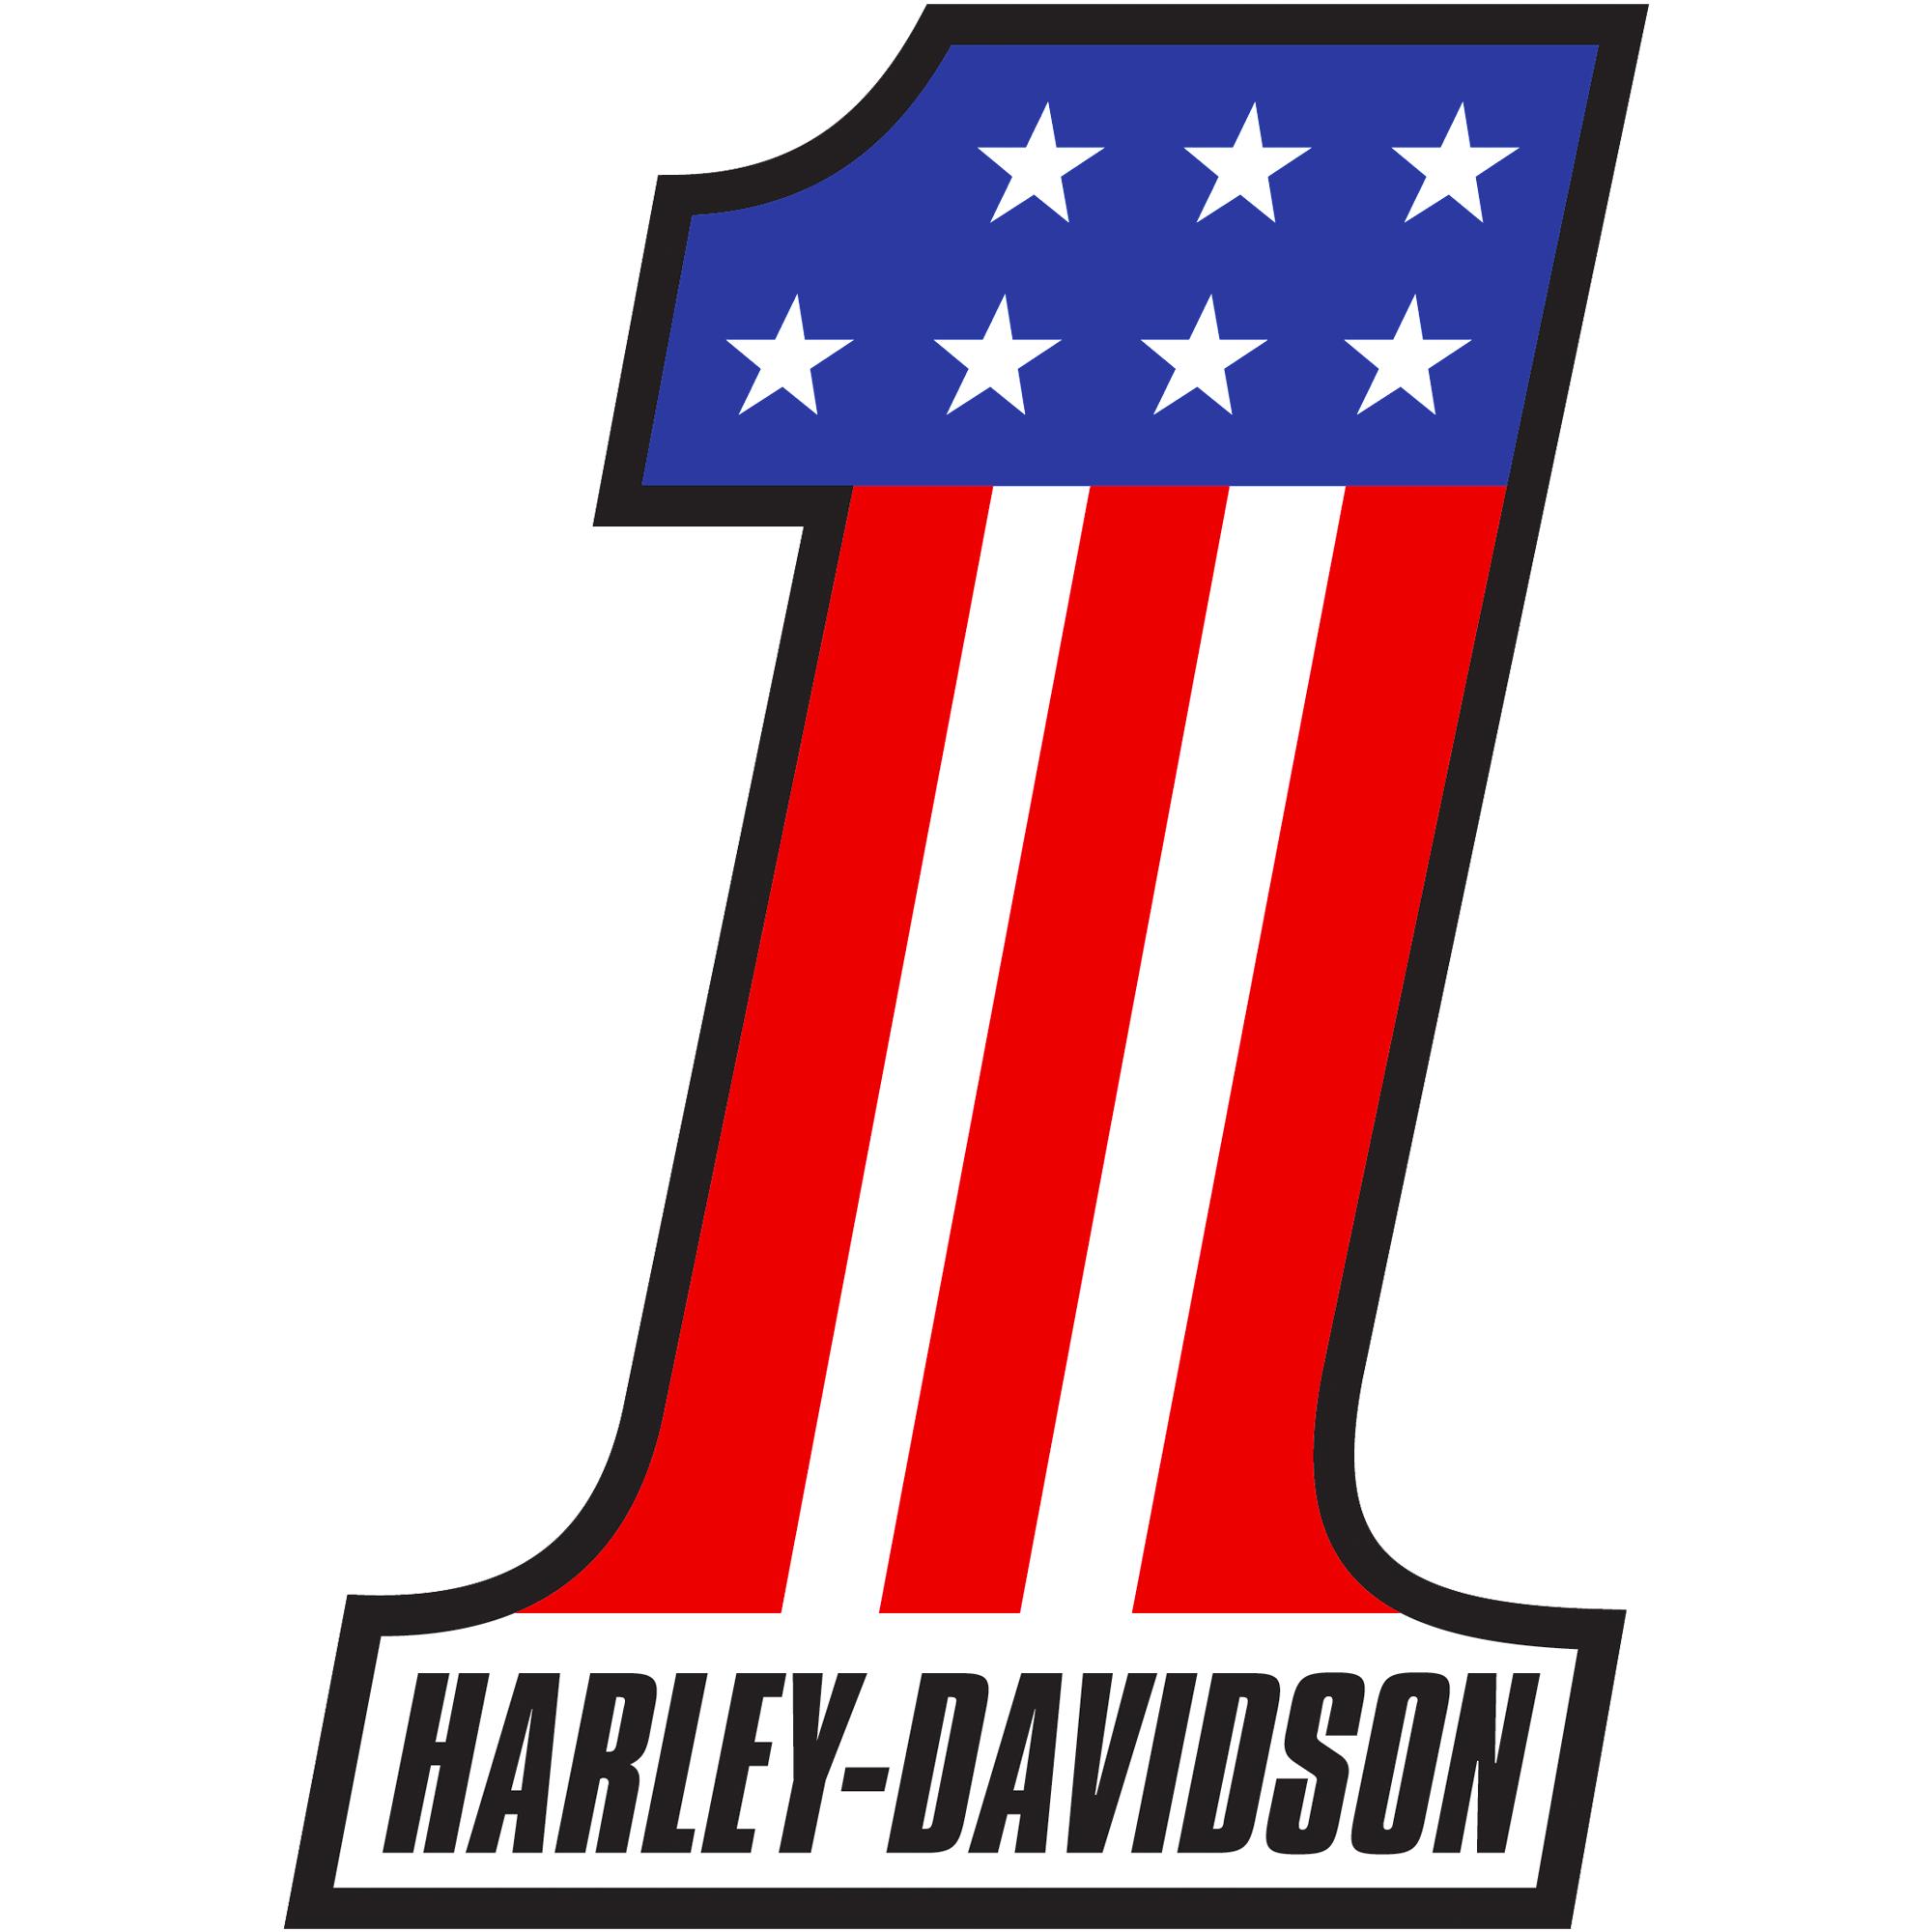 Kmisetas Galeria De Estampas Para Suas Camisetas Vrod - Stickers for motorcycles harley davidsonsbest harley davidson images on pinterest